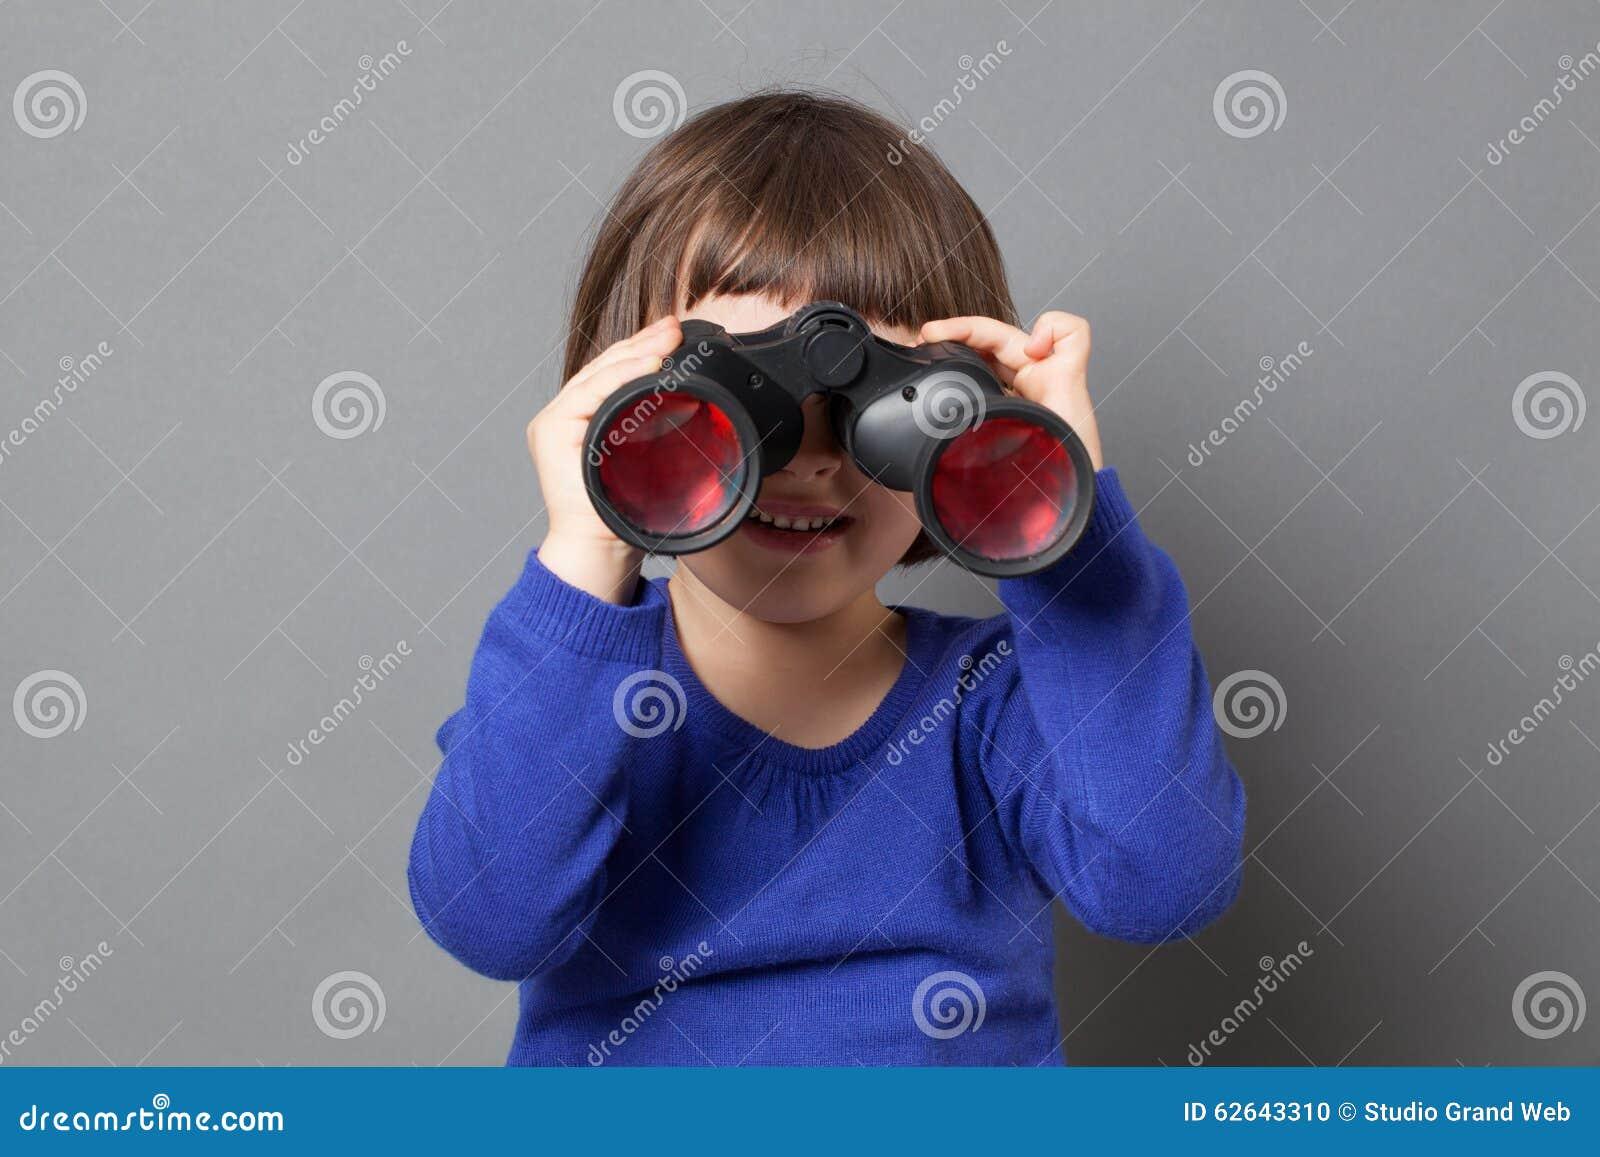 Kid exploration concept with binoculars